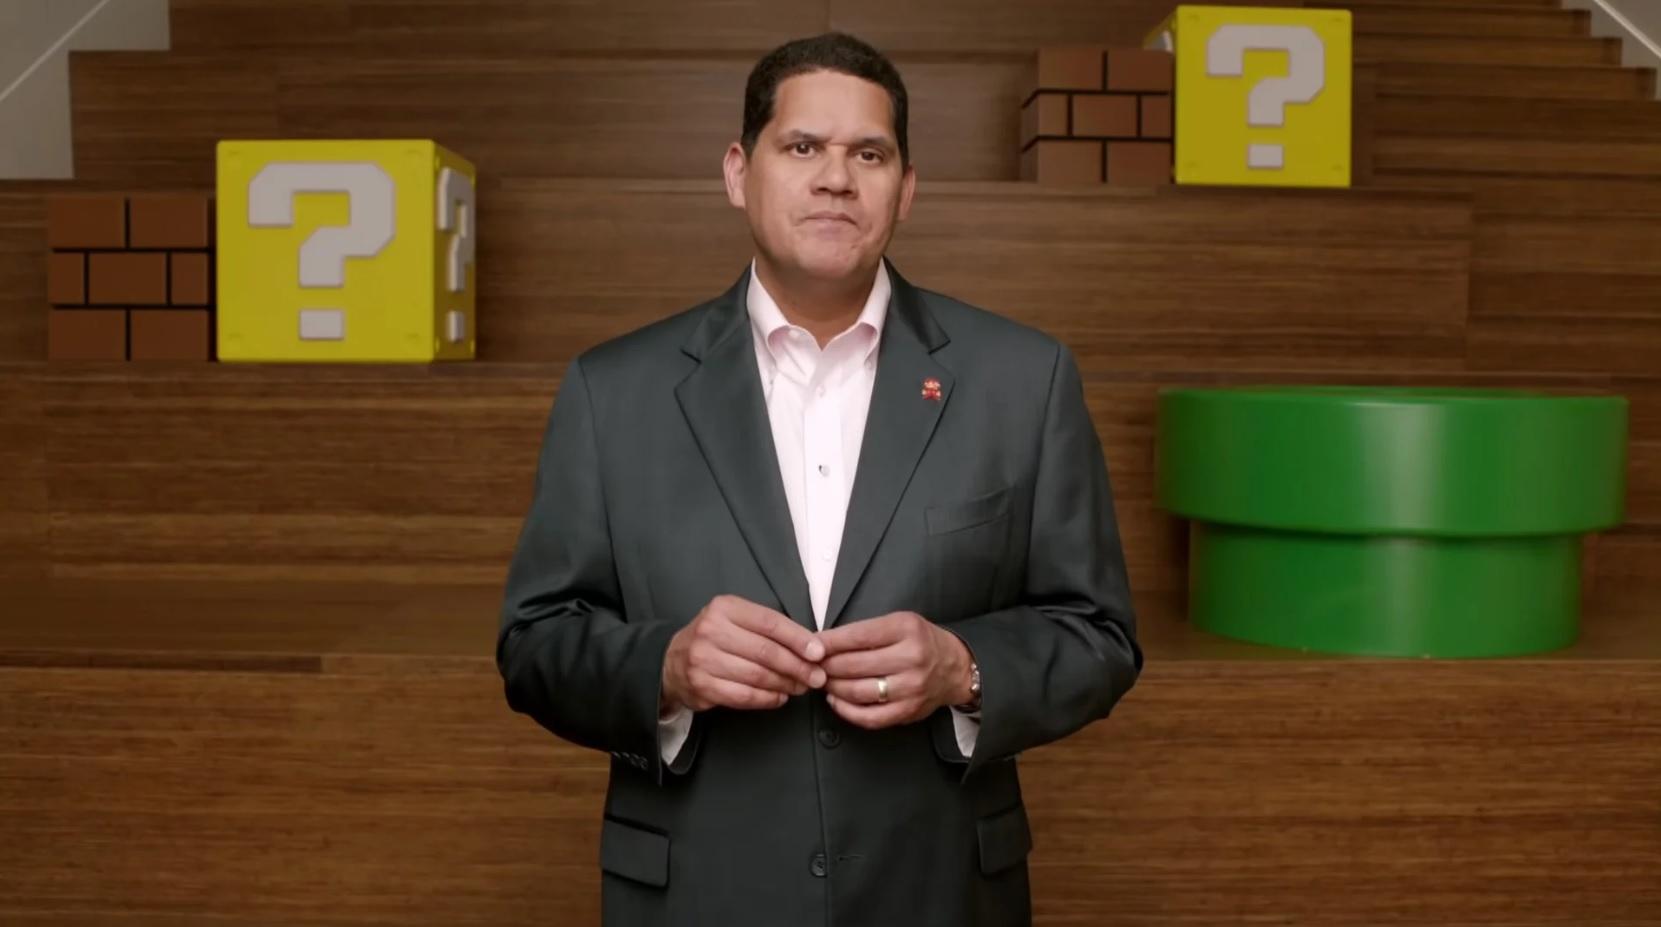 GameStop's new strategy to save itself? Hire Reggie Fils-Aime screenshot